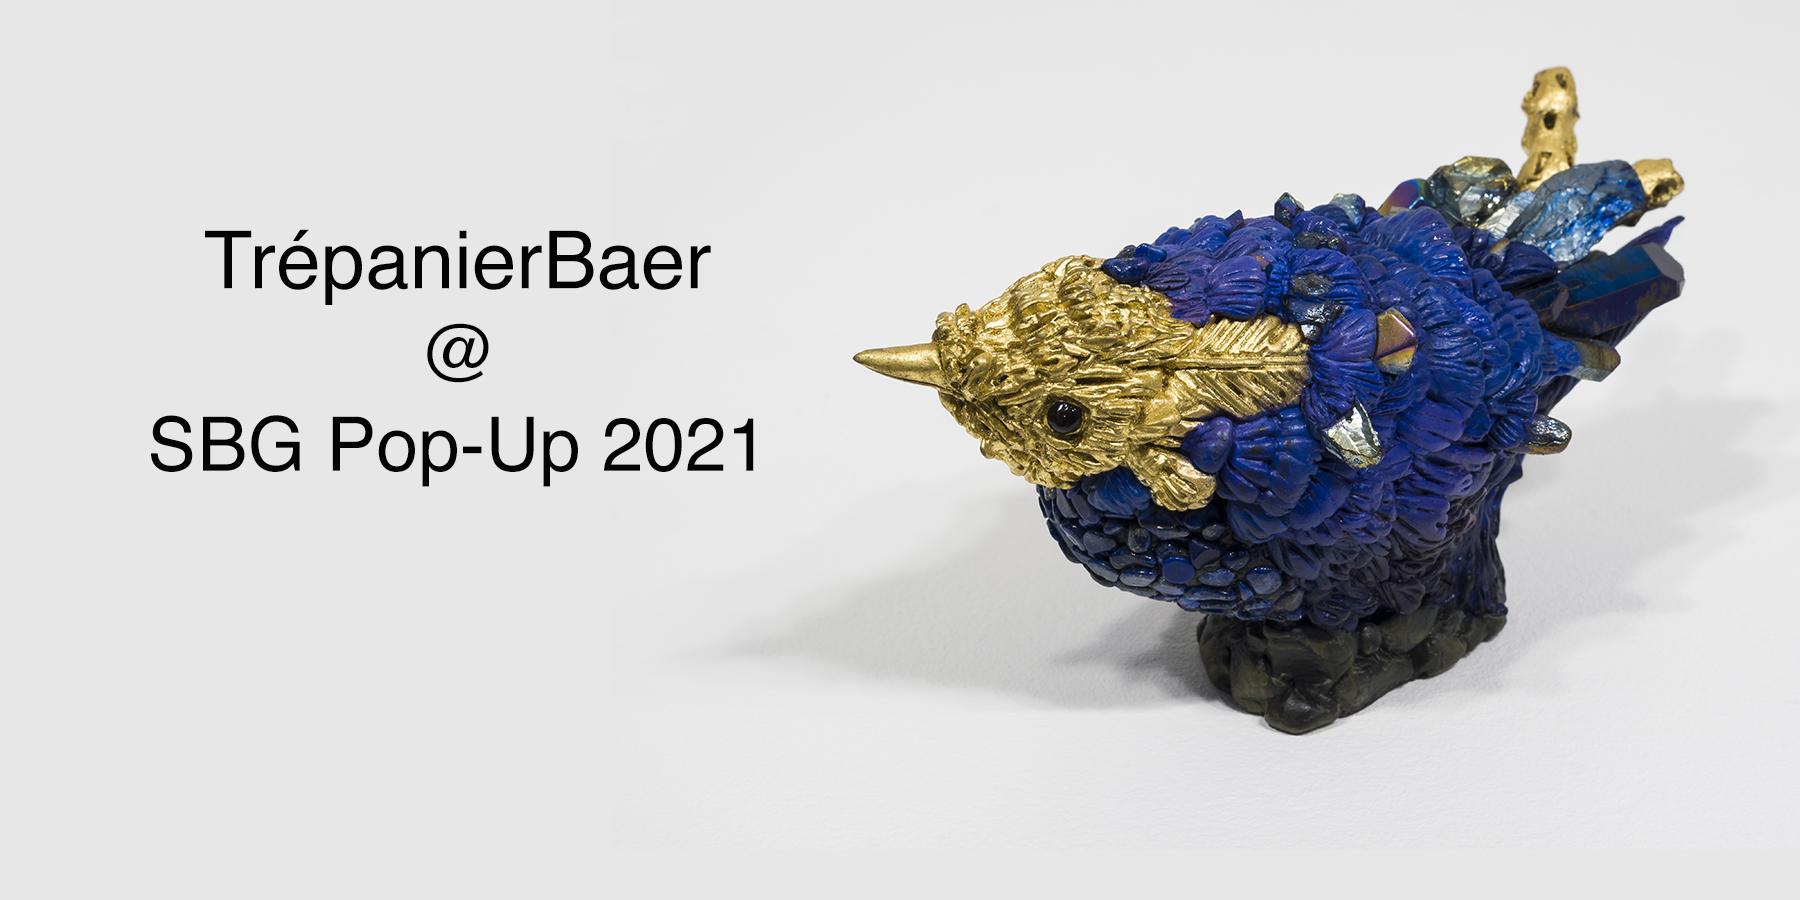 TrépanierBaer at SBG Pop-Up 2021